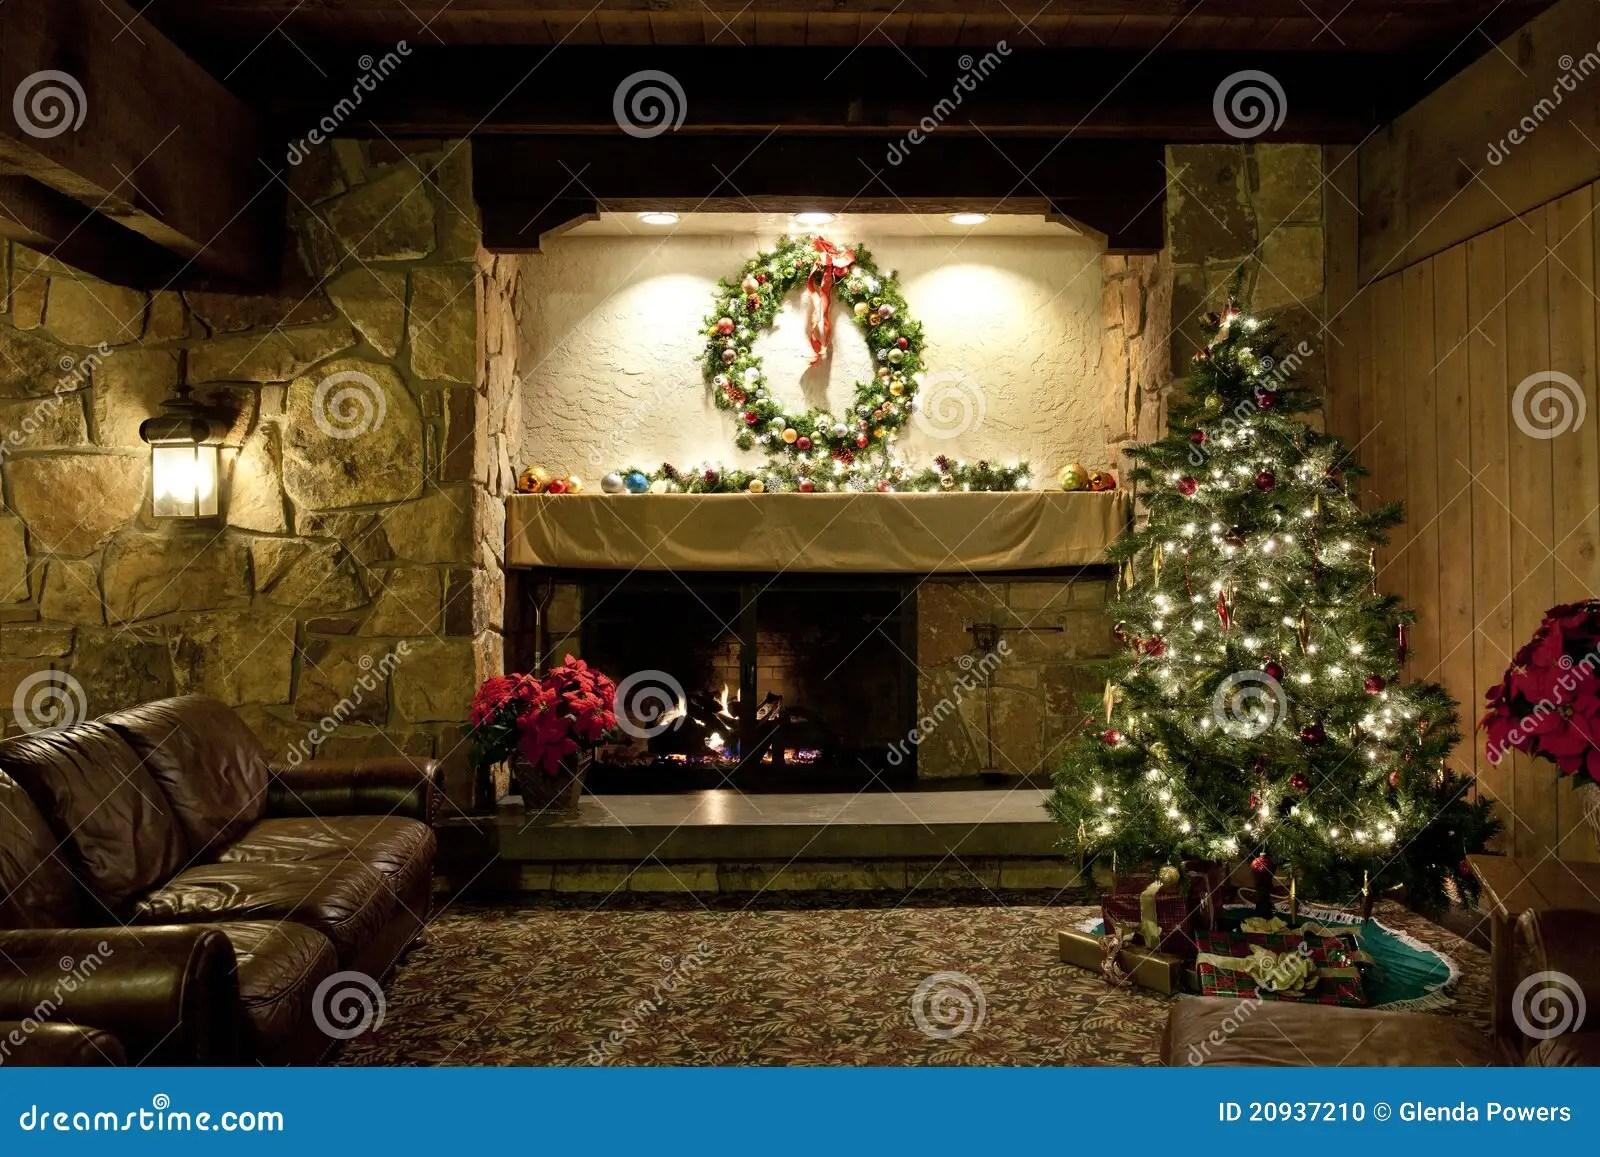 Rustic Christmas Living Room Stock Photo Image Of Carpet